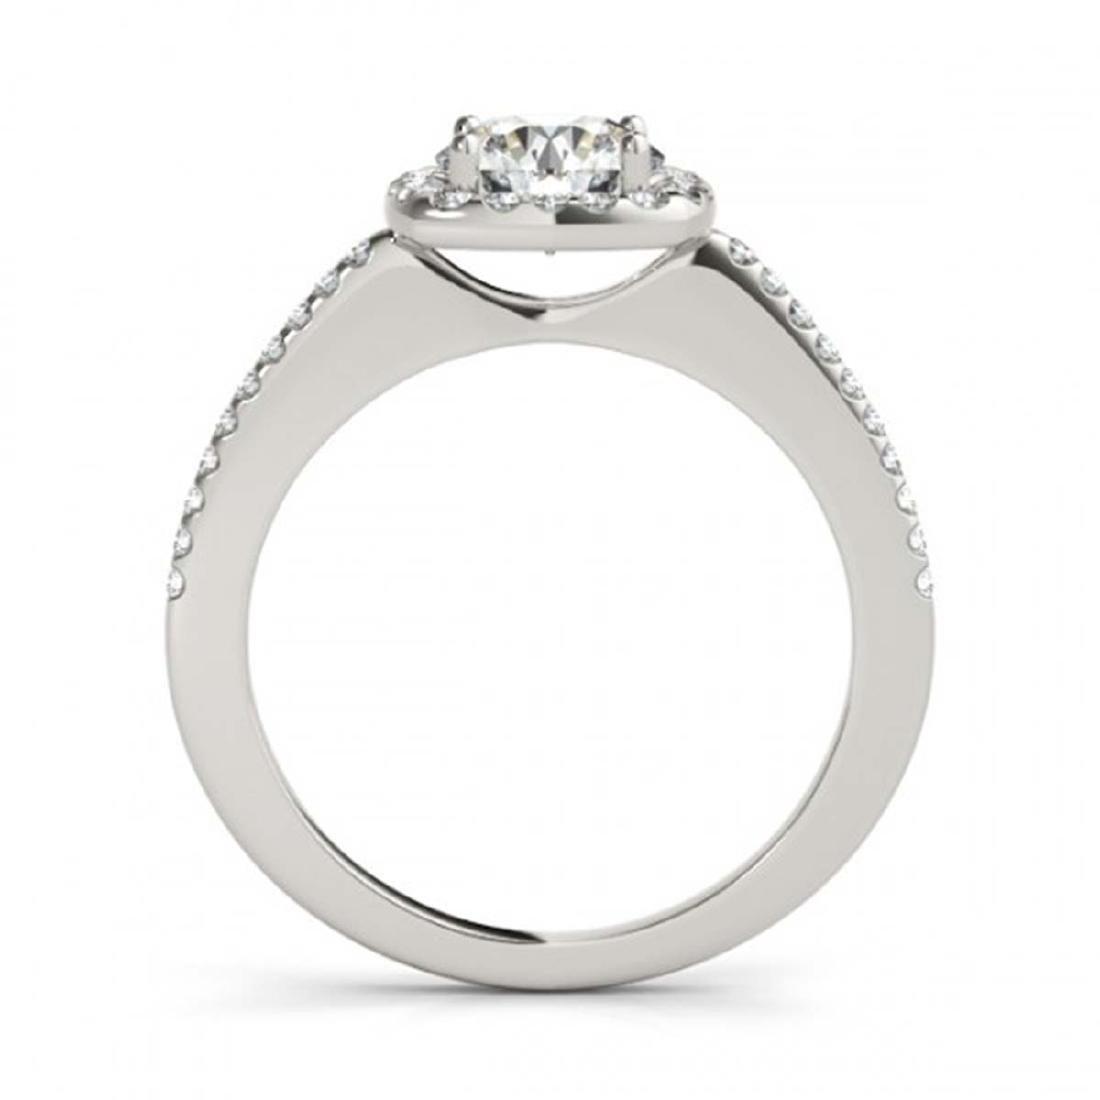 0.75 ctw VS/SI Diamond Halo Ring 14K White Gold - - 2